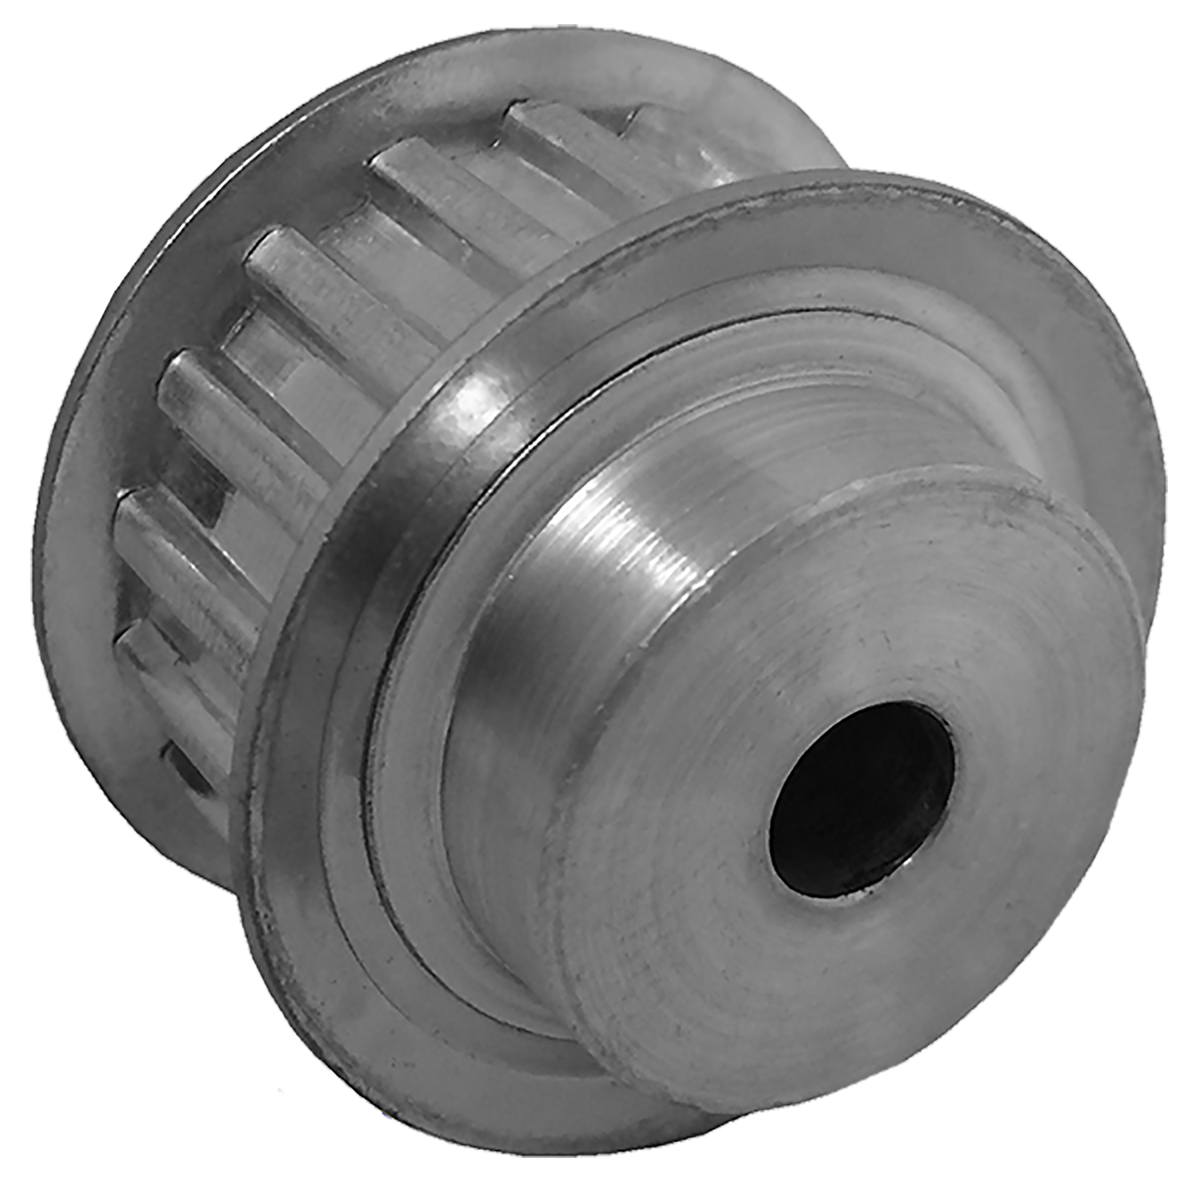 21T5/18-2 - Aluminum Metric Pulleys